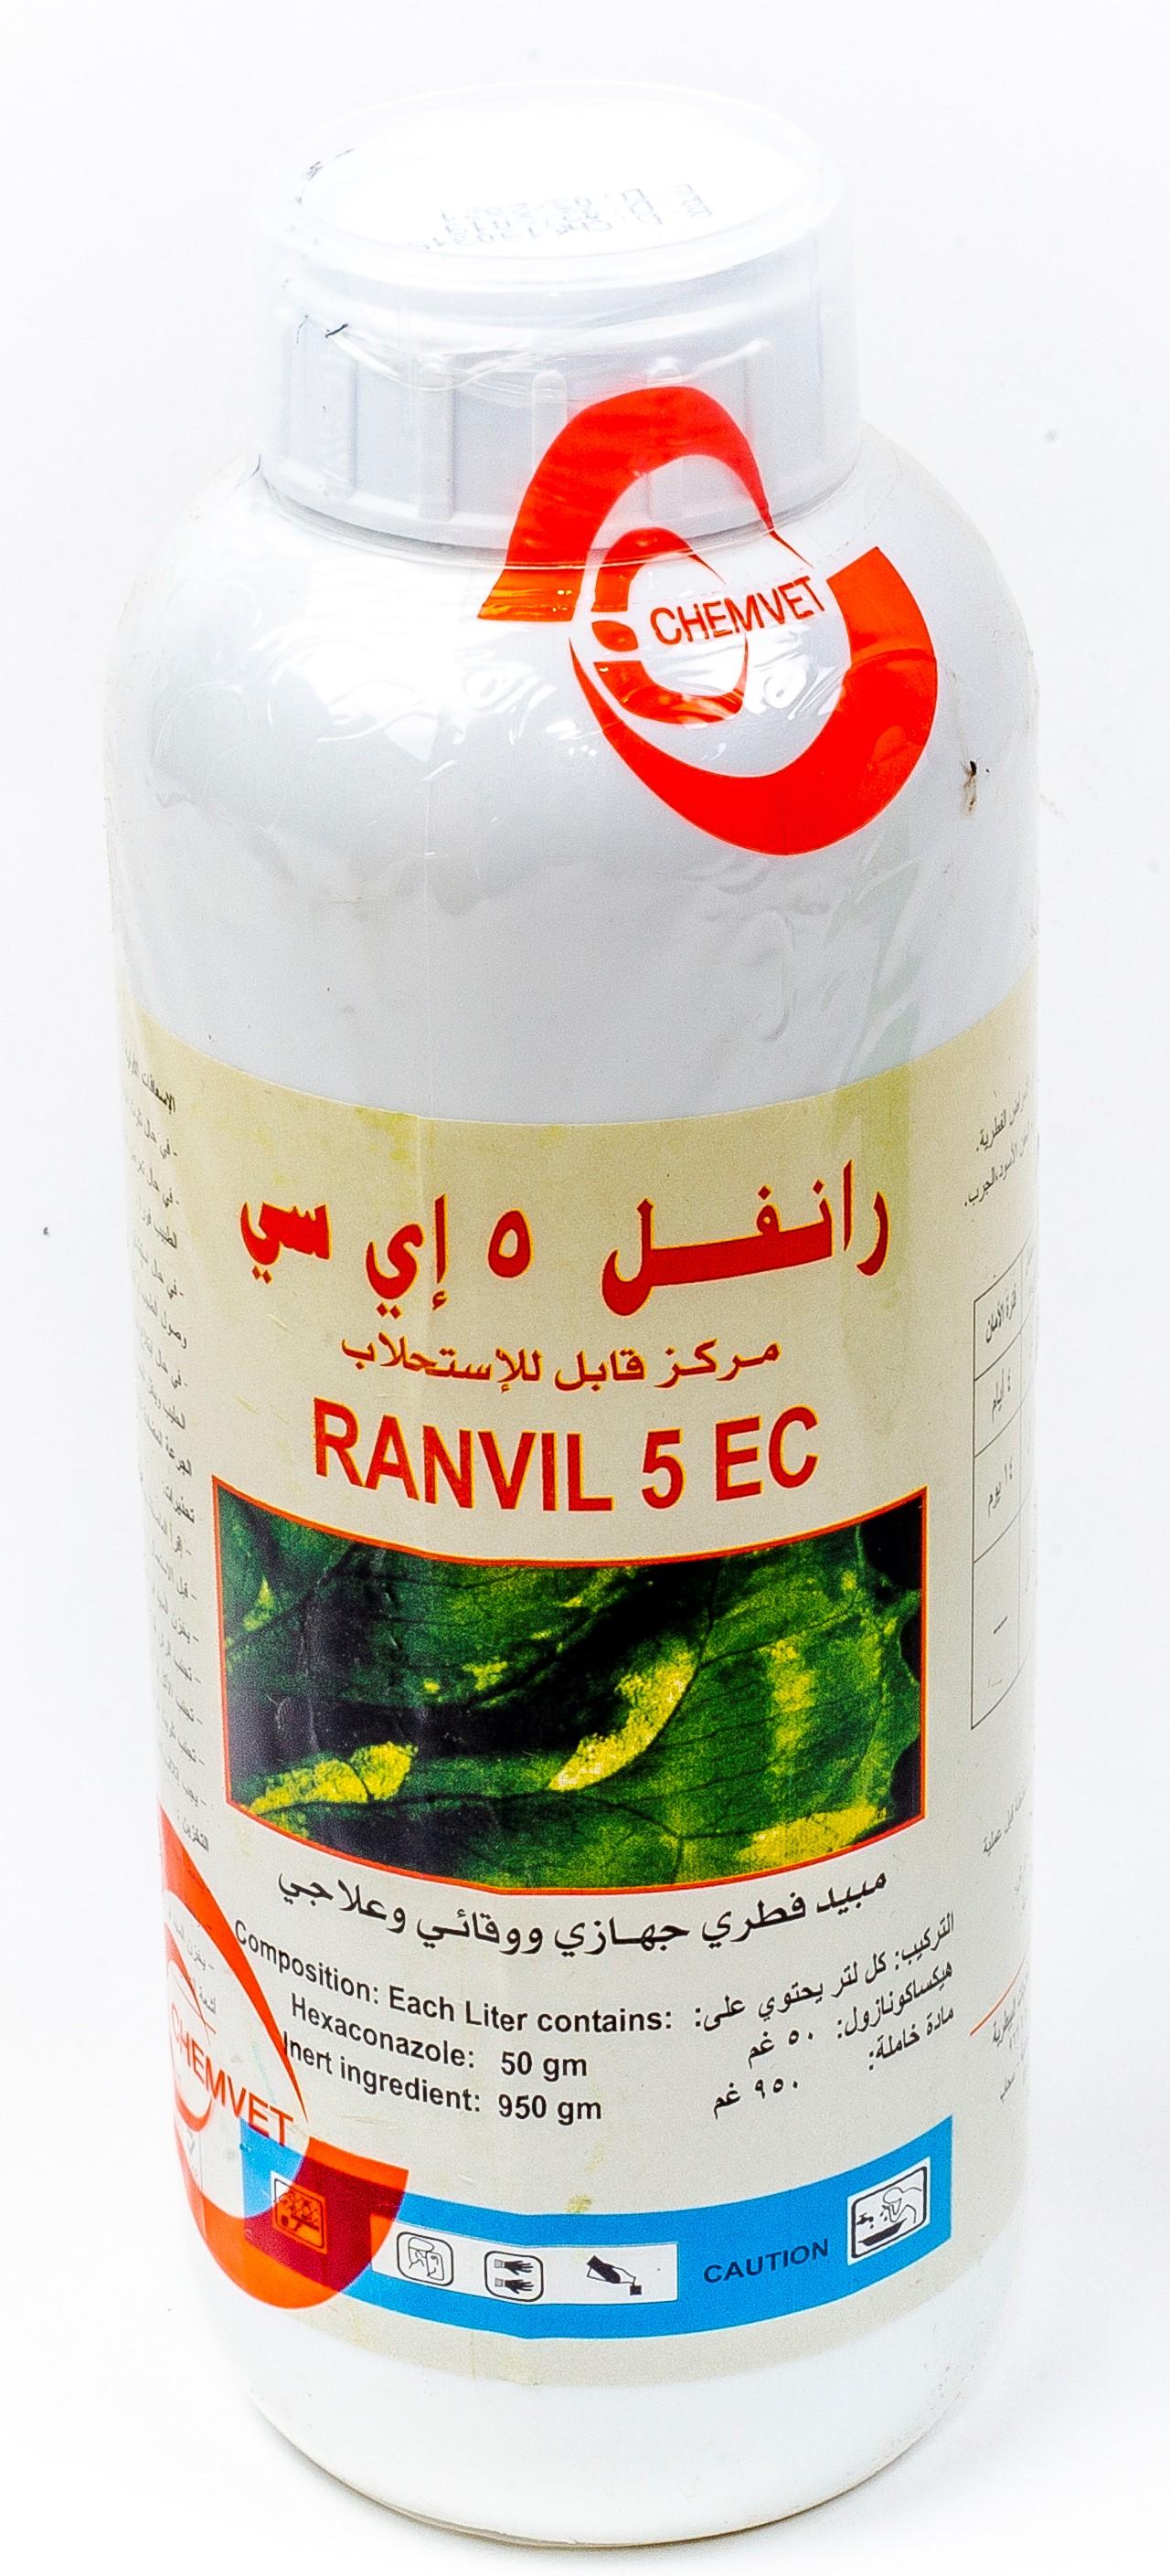 Ranvil 5 EC